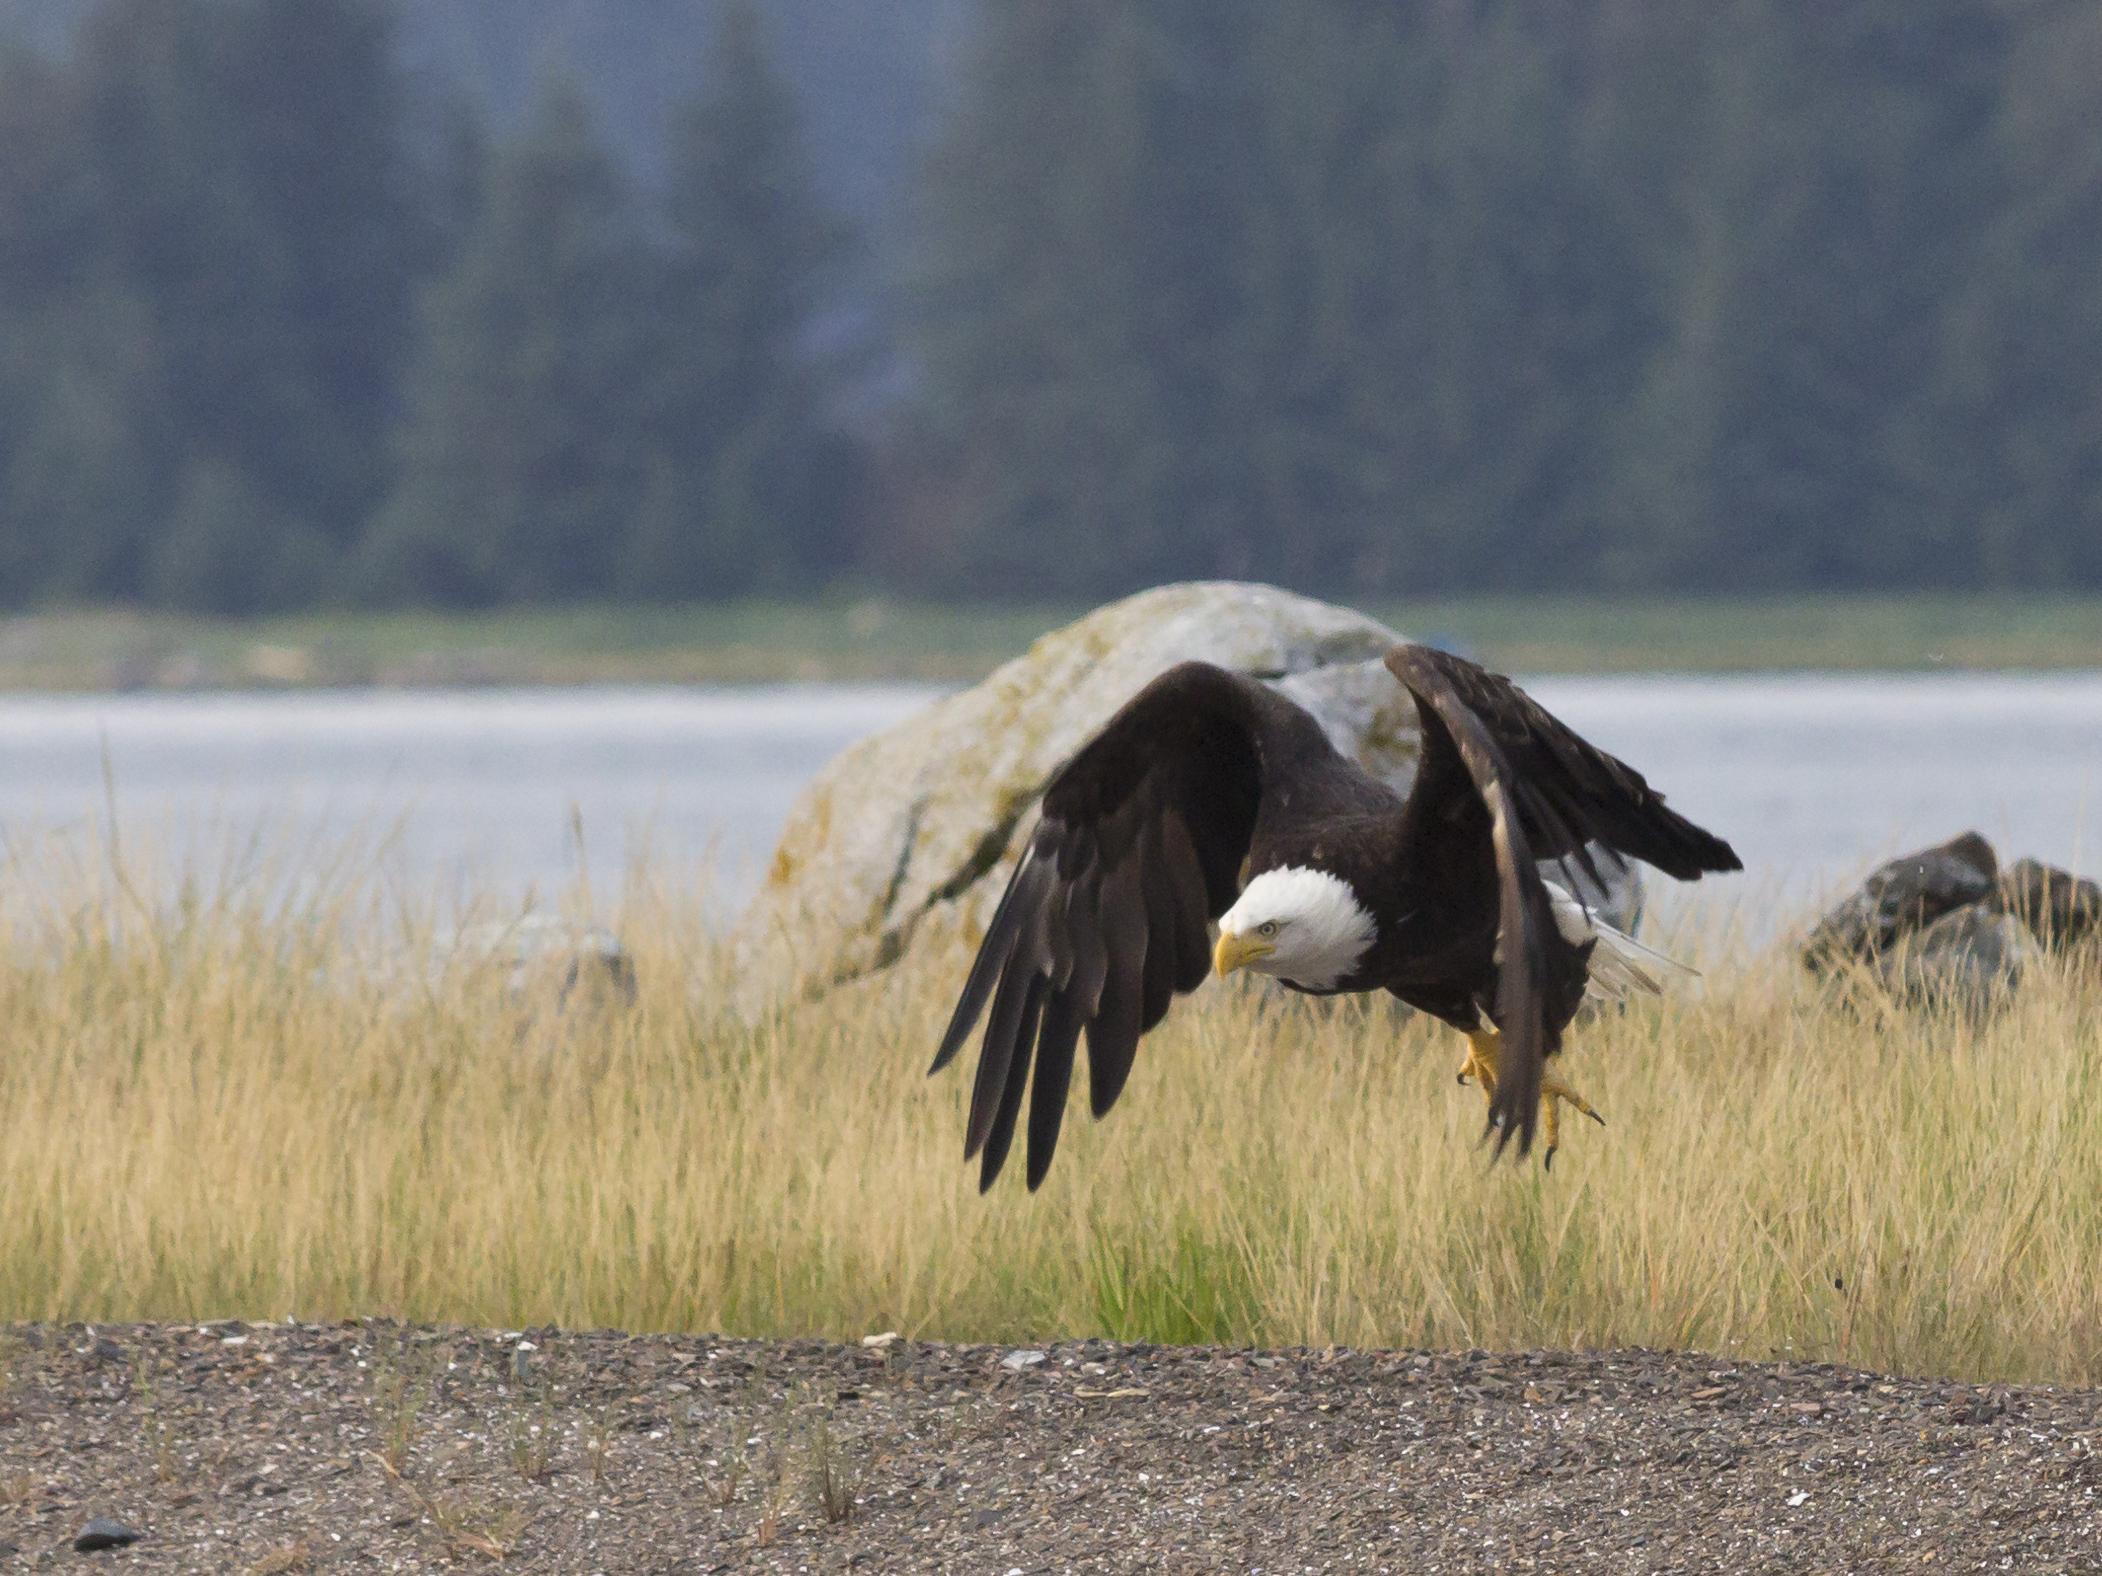 2013-07-17 bald eagle at Swanson Harbor 02.jpg